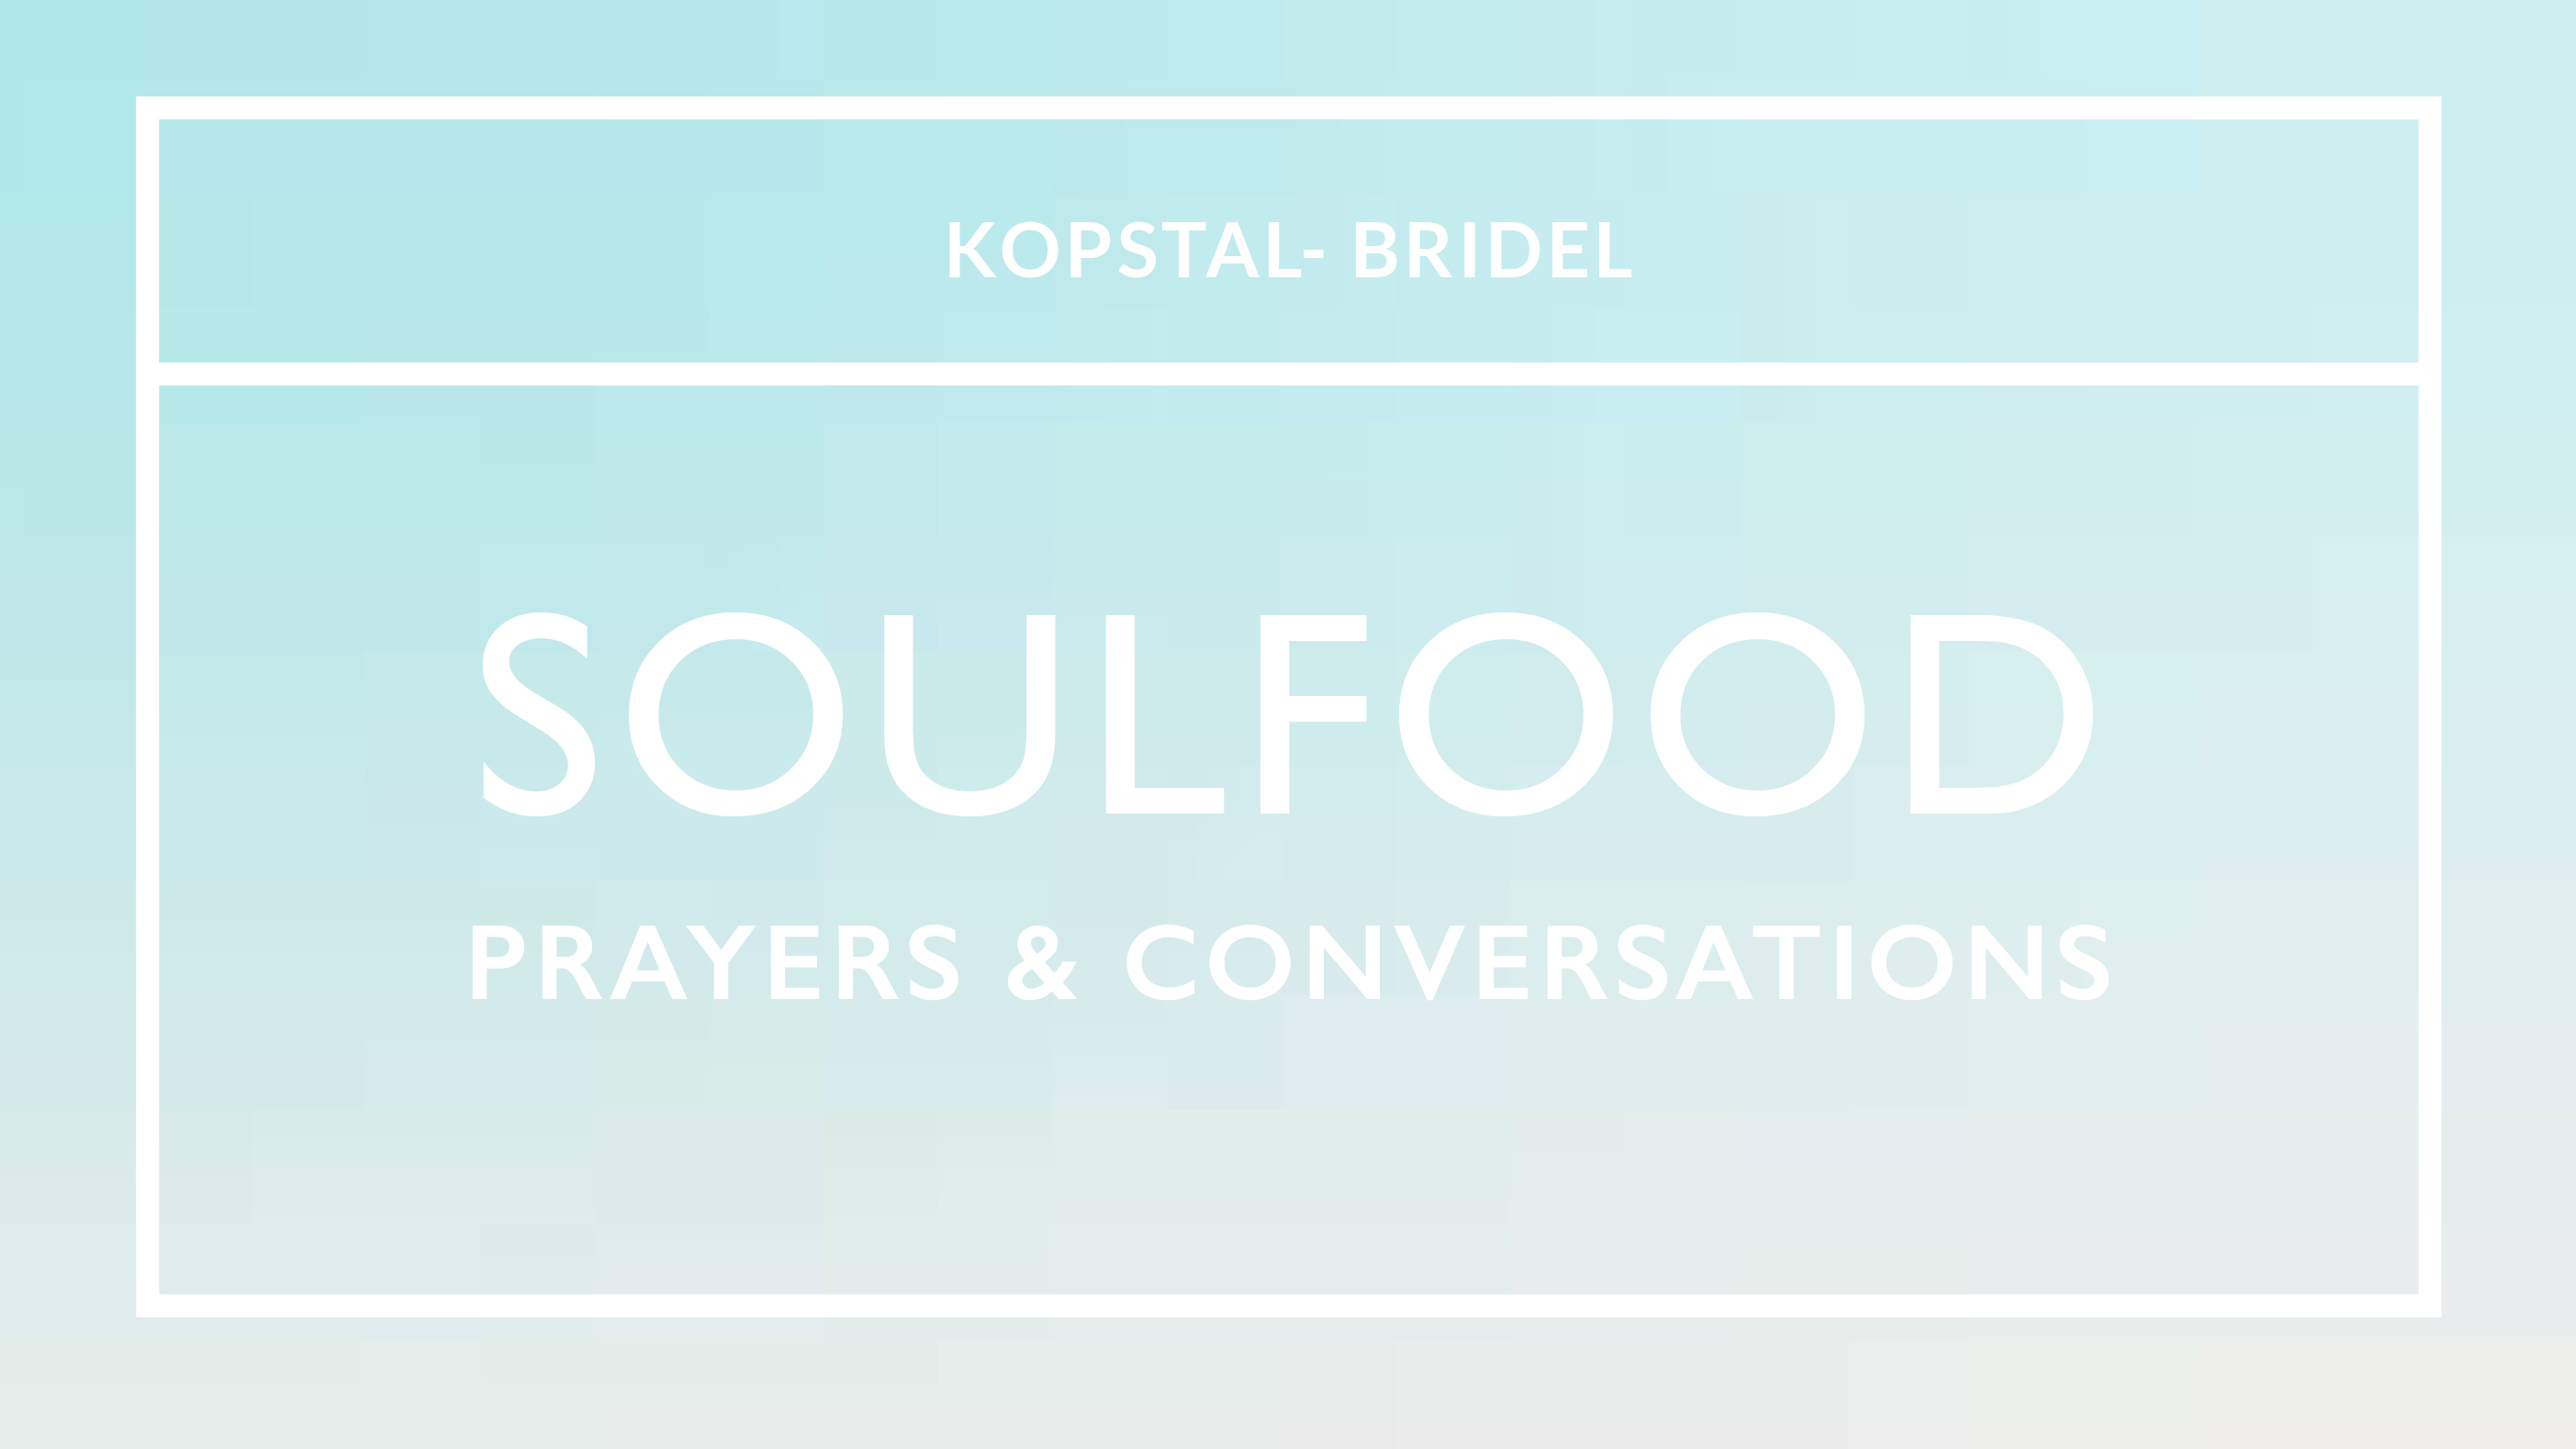 Soulfood Kopstal-Bridel - Prayers and Conversations